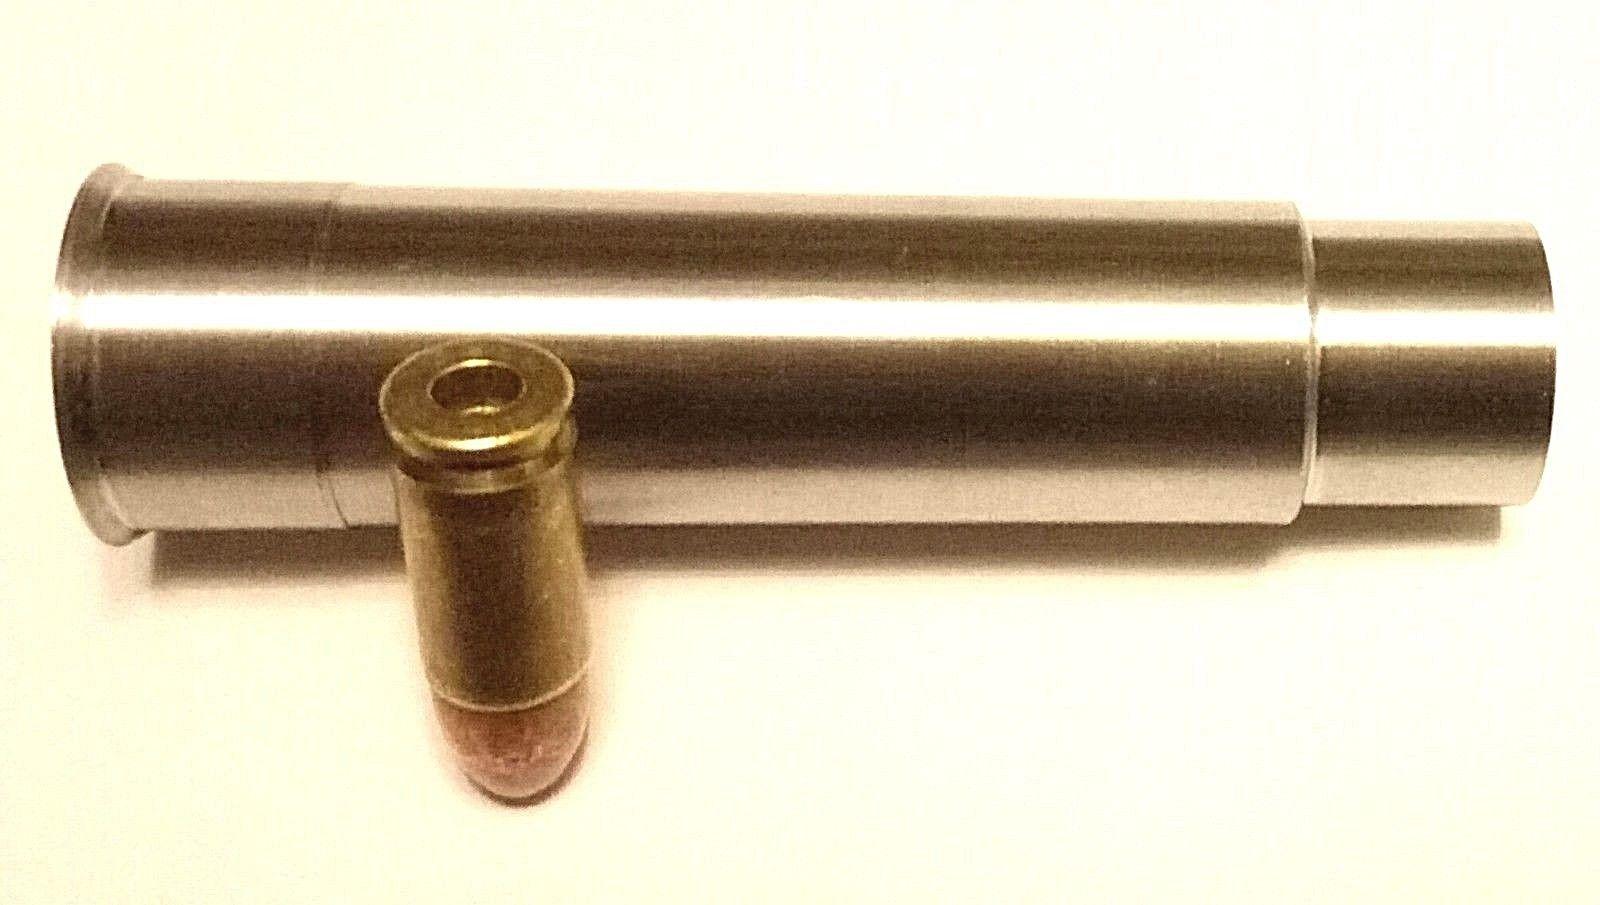 s l1600 10 - 12 Gauge to 9mm Luger Shotgun Barrel Adapter LONG Chamber Reducer